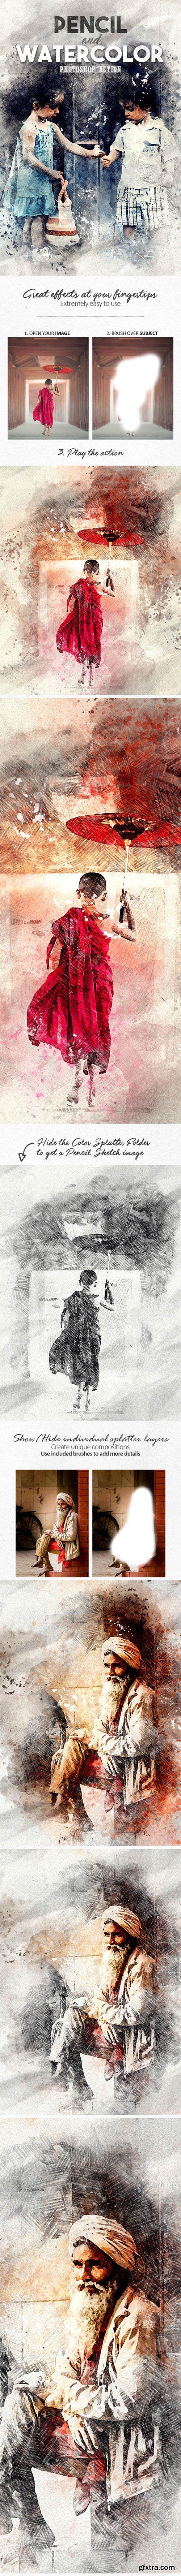 Graphicriver - Pencil n Watercolor Photoshop Action 19586973